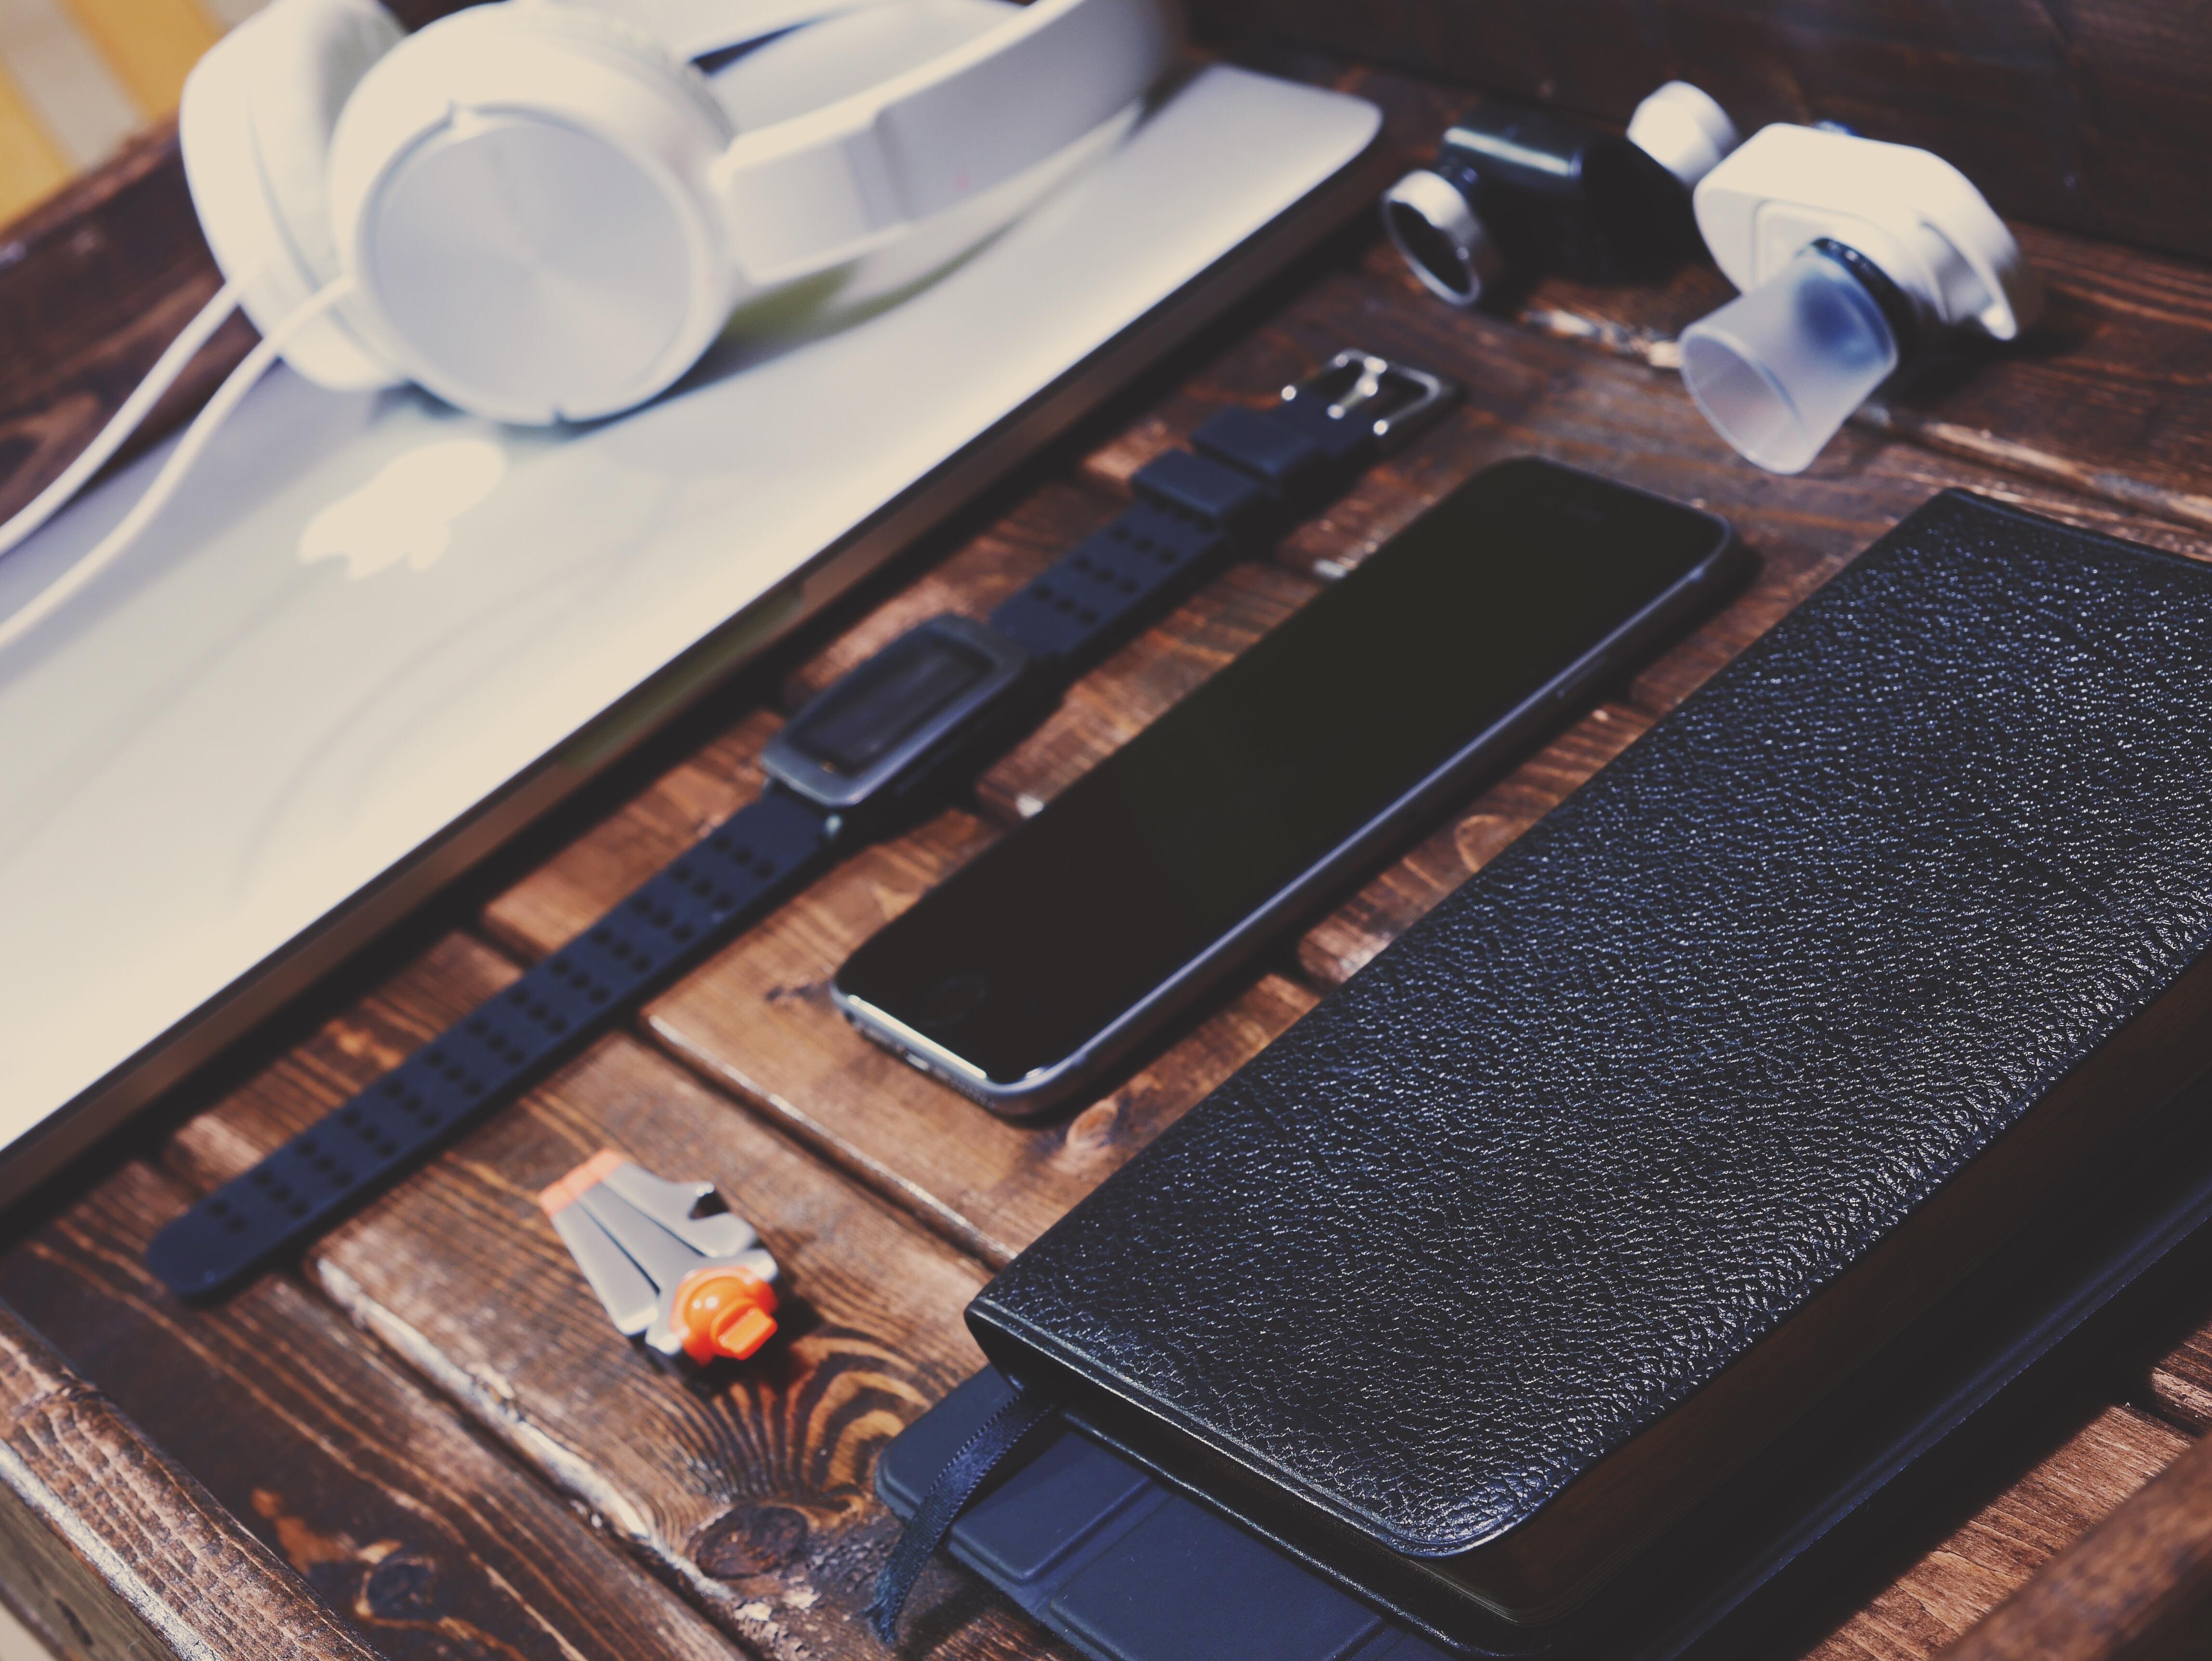 Watch Table Wood Technology Headphone Phone Office Furniture Flooring